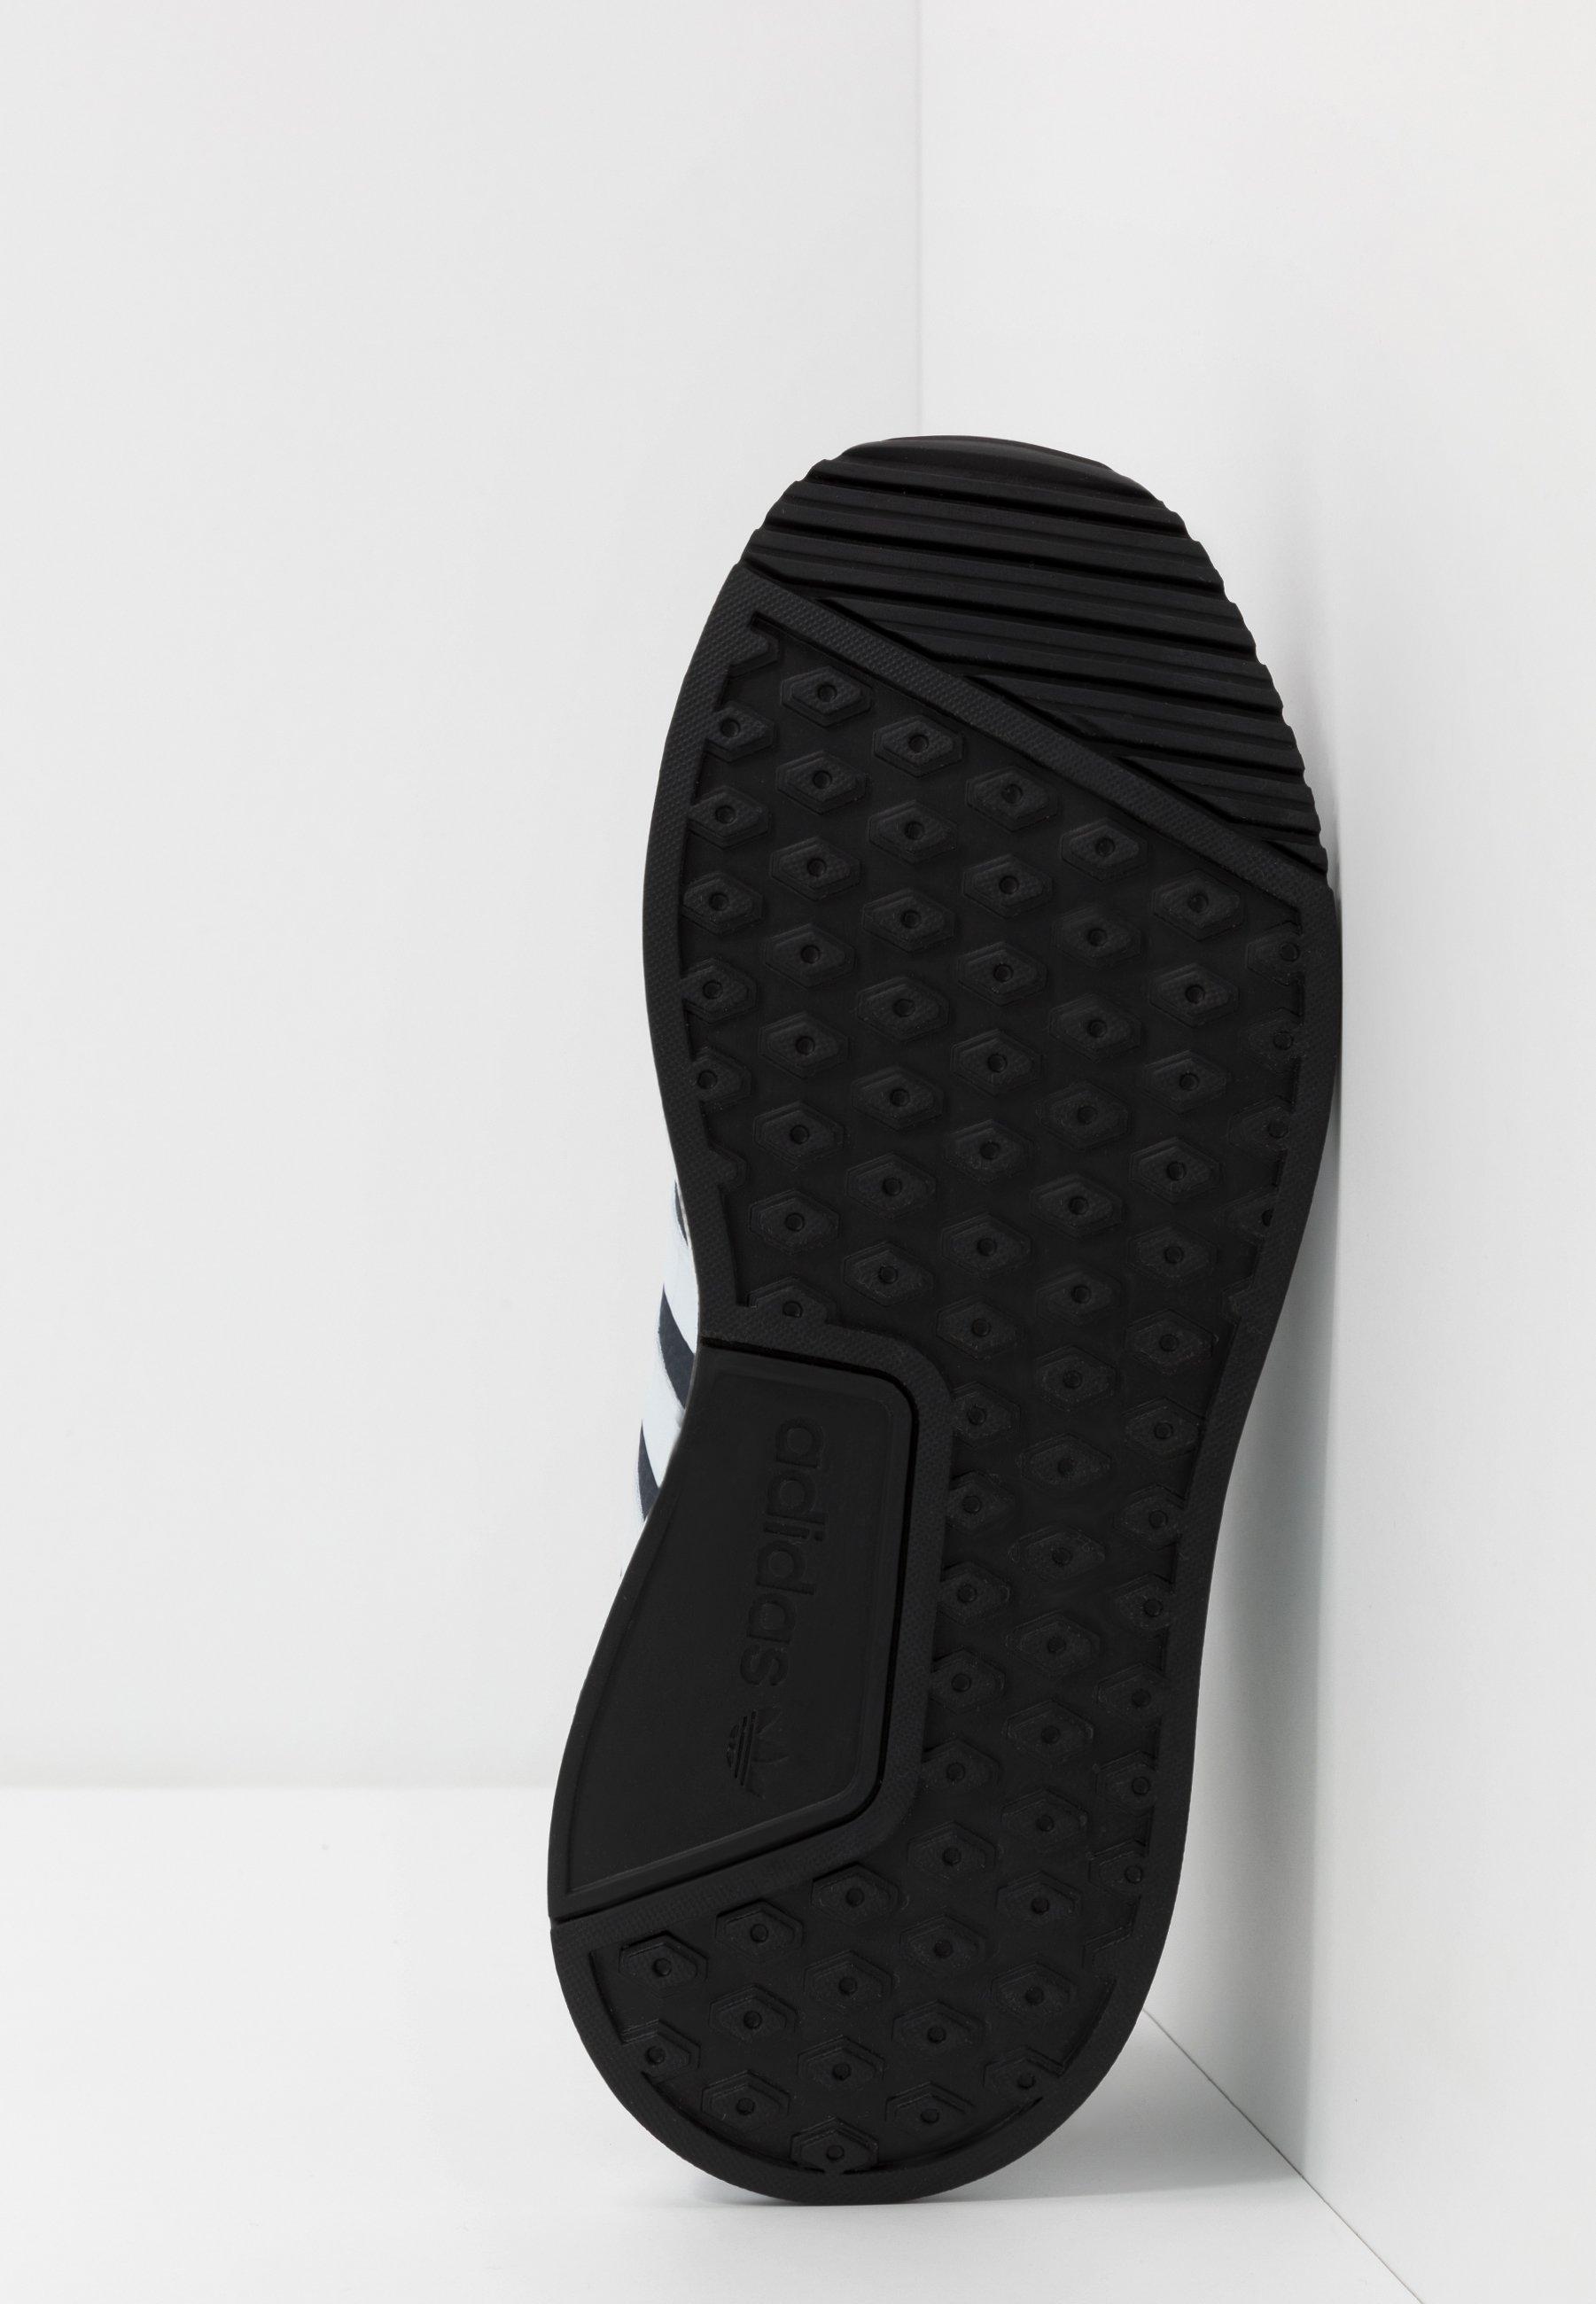 Geringster Preis adidas Originals X PLR - Sneaker low - collegiate navy/footwear white/core black   Damenbekleidung 2020